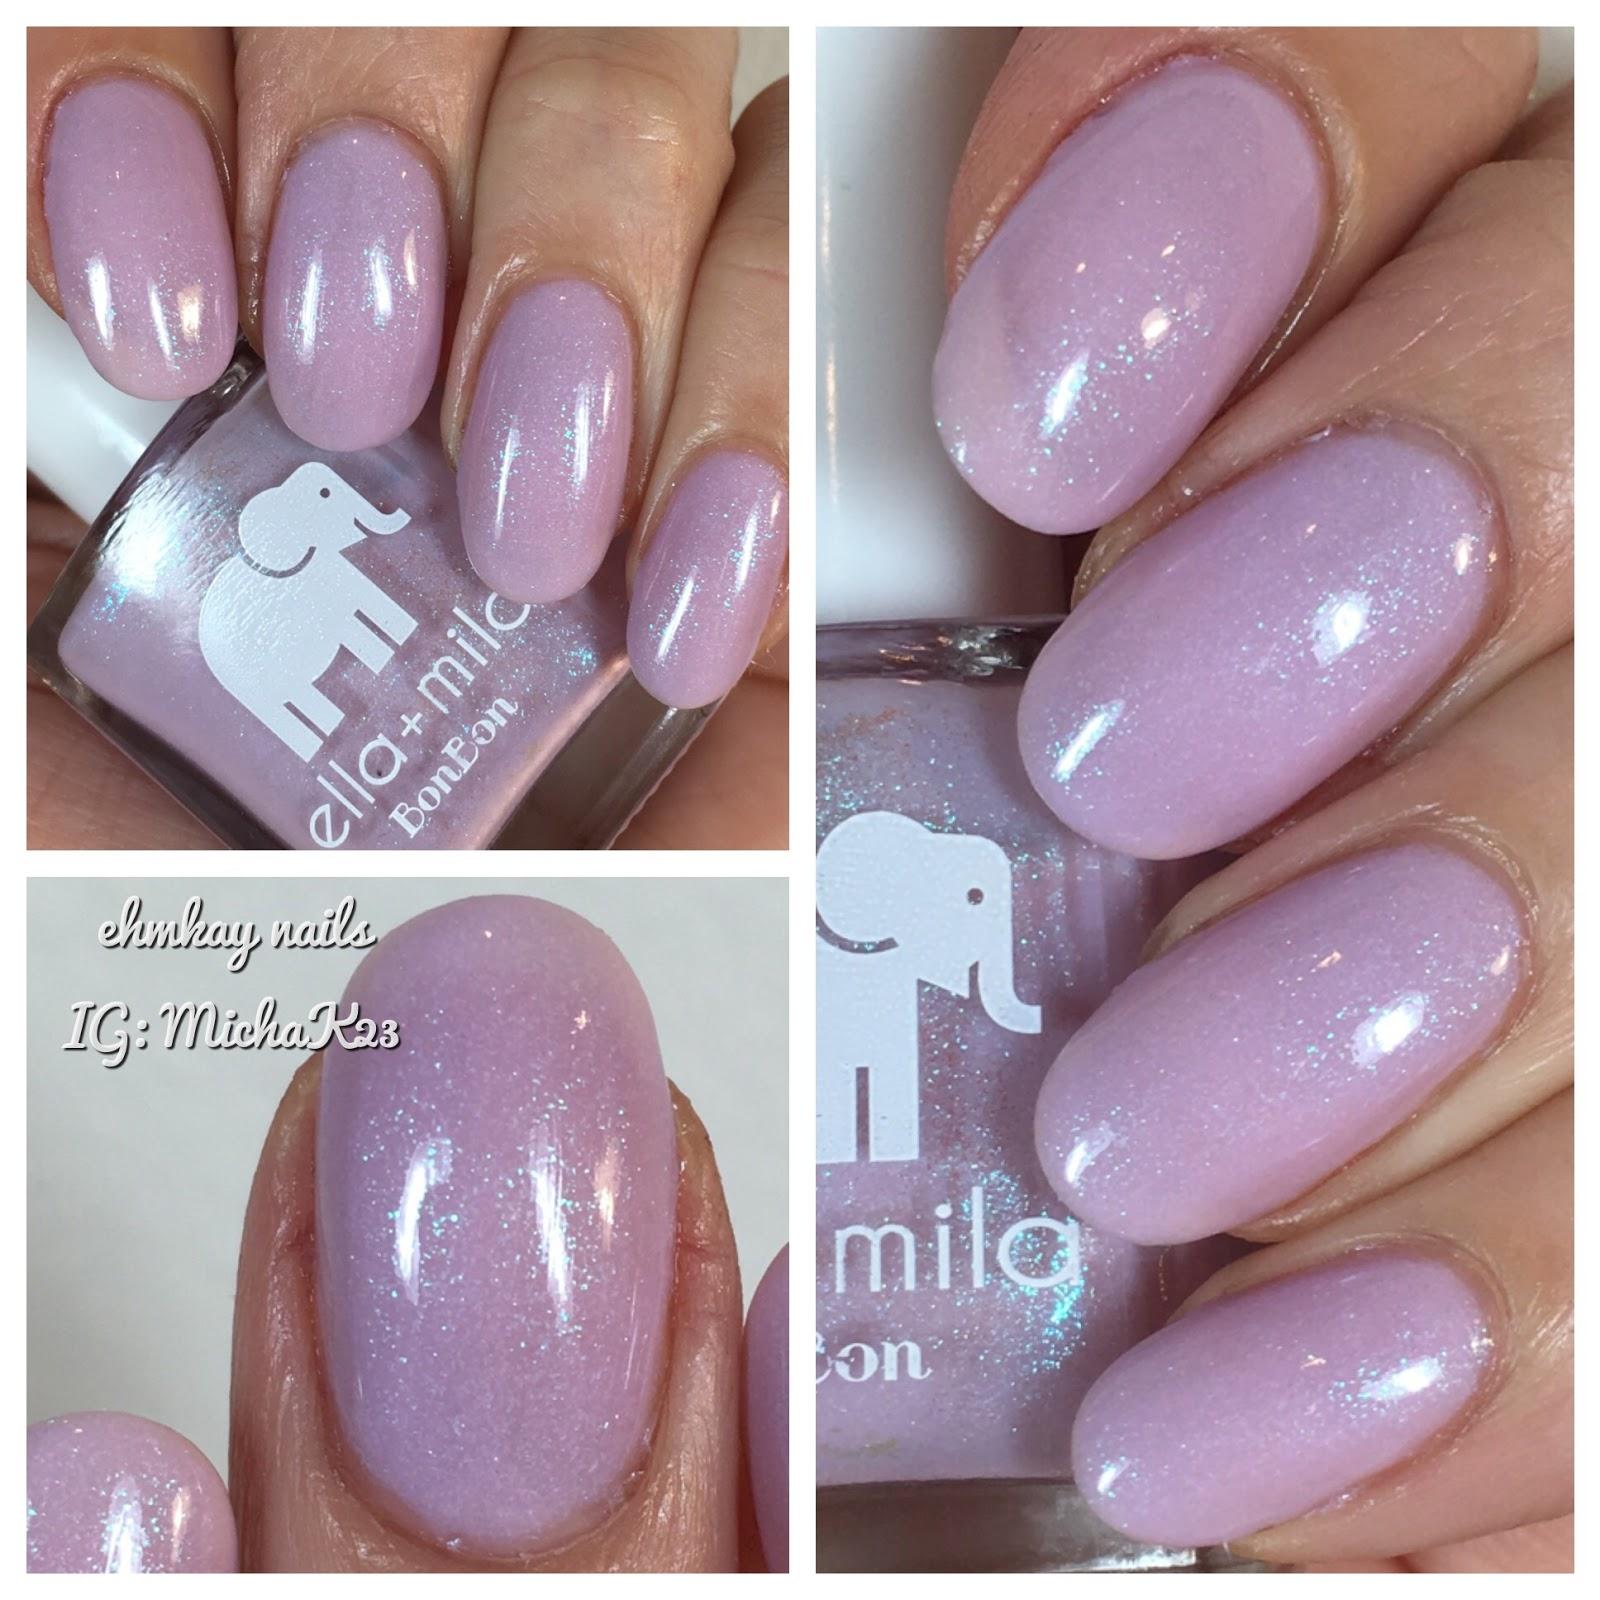 ehmkay nails: Ella + Mila Midnight in Paris